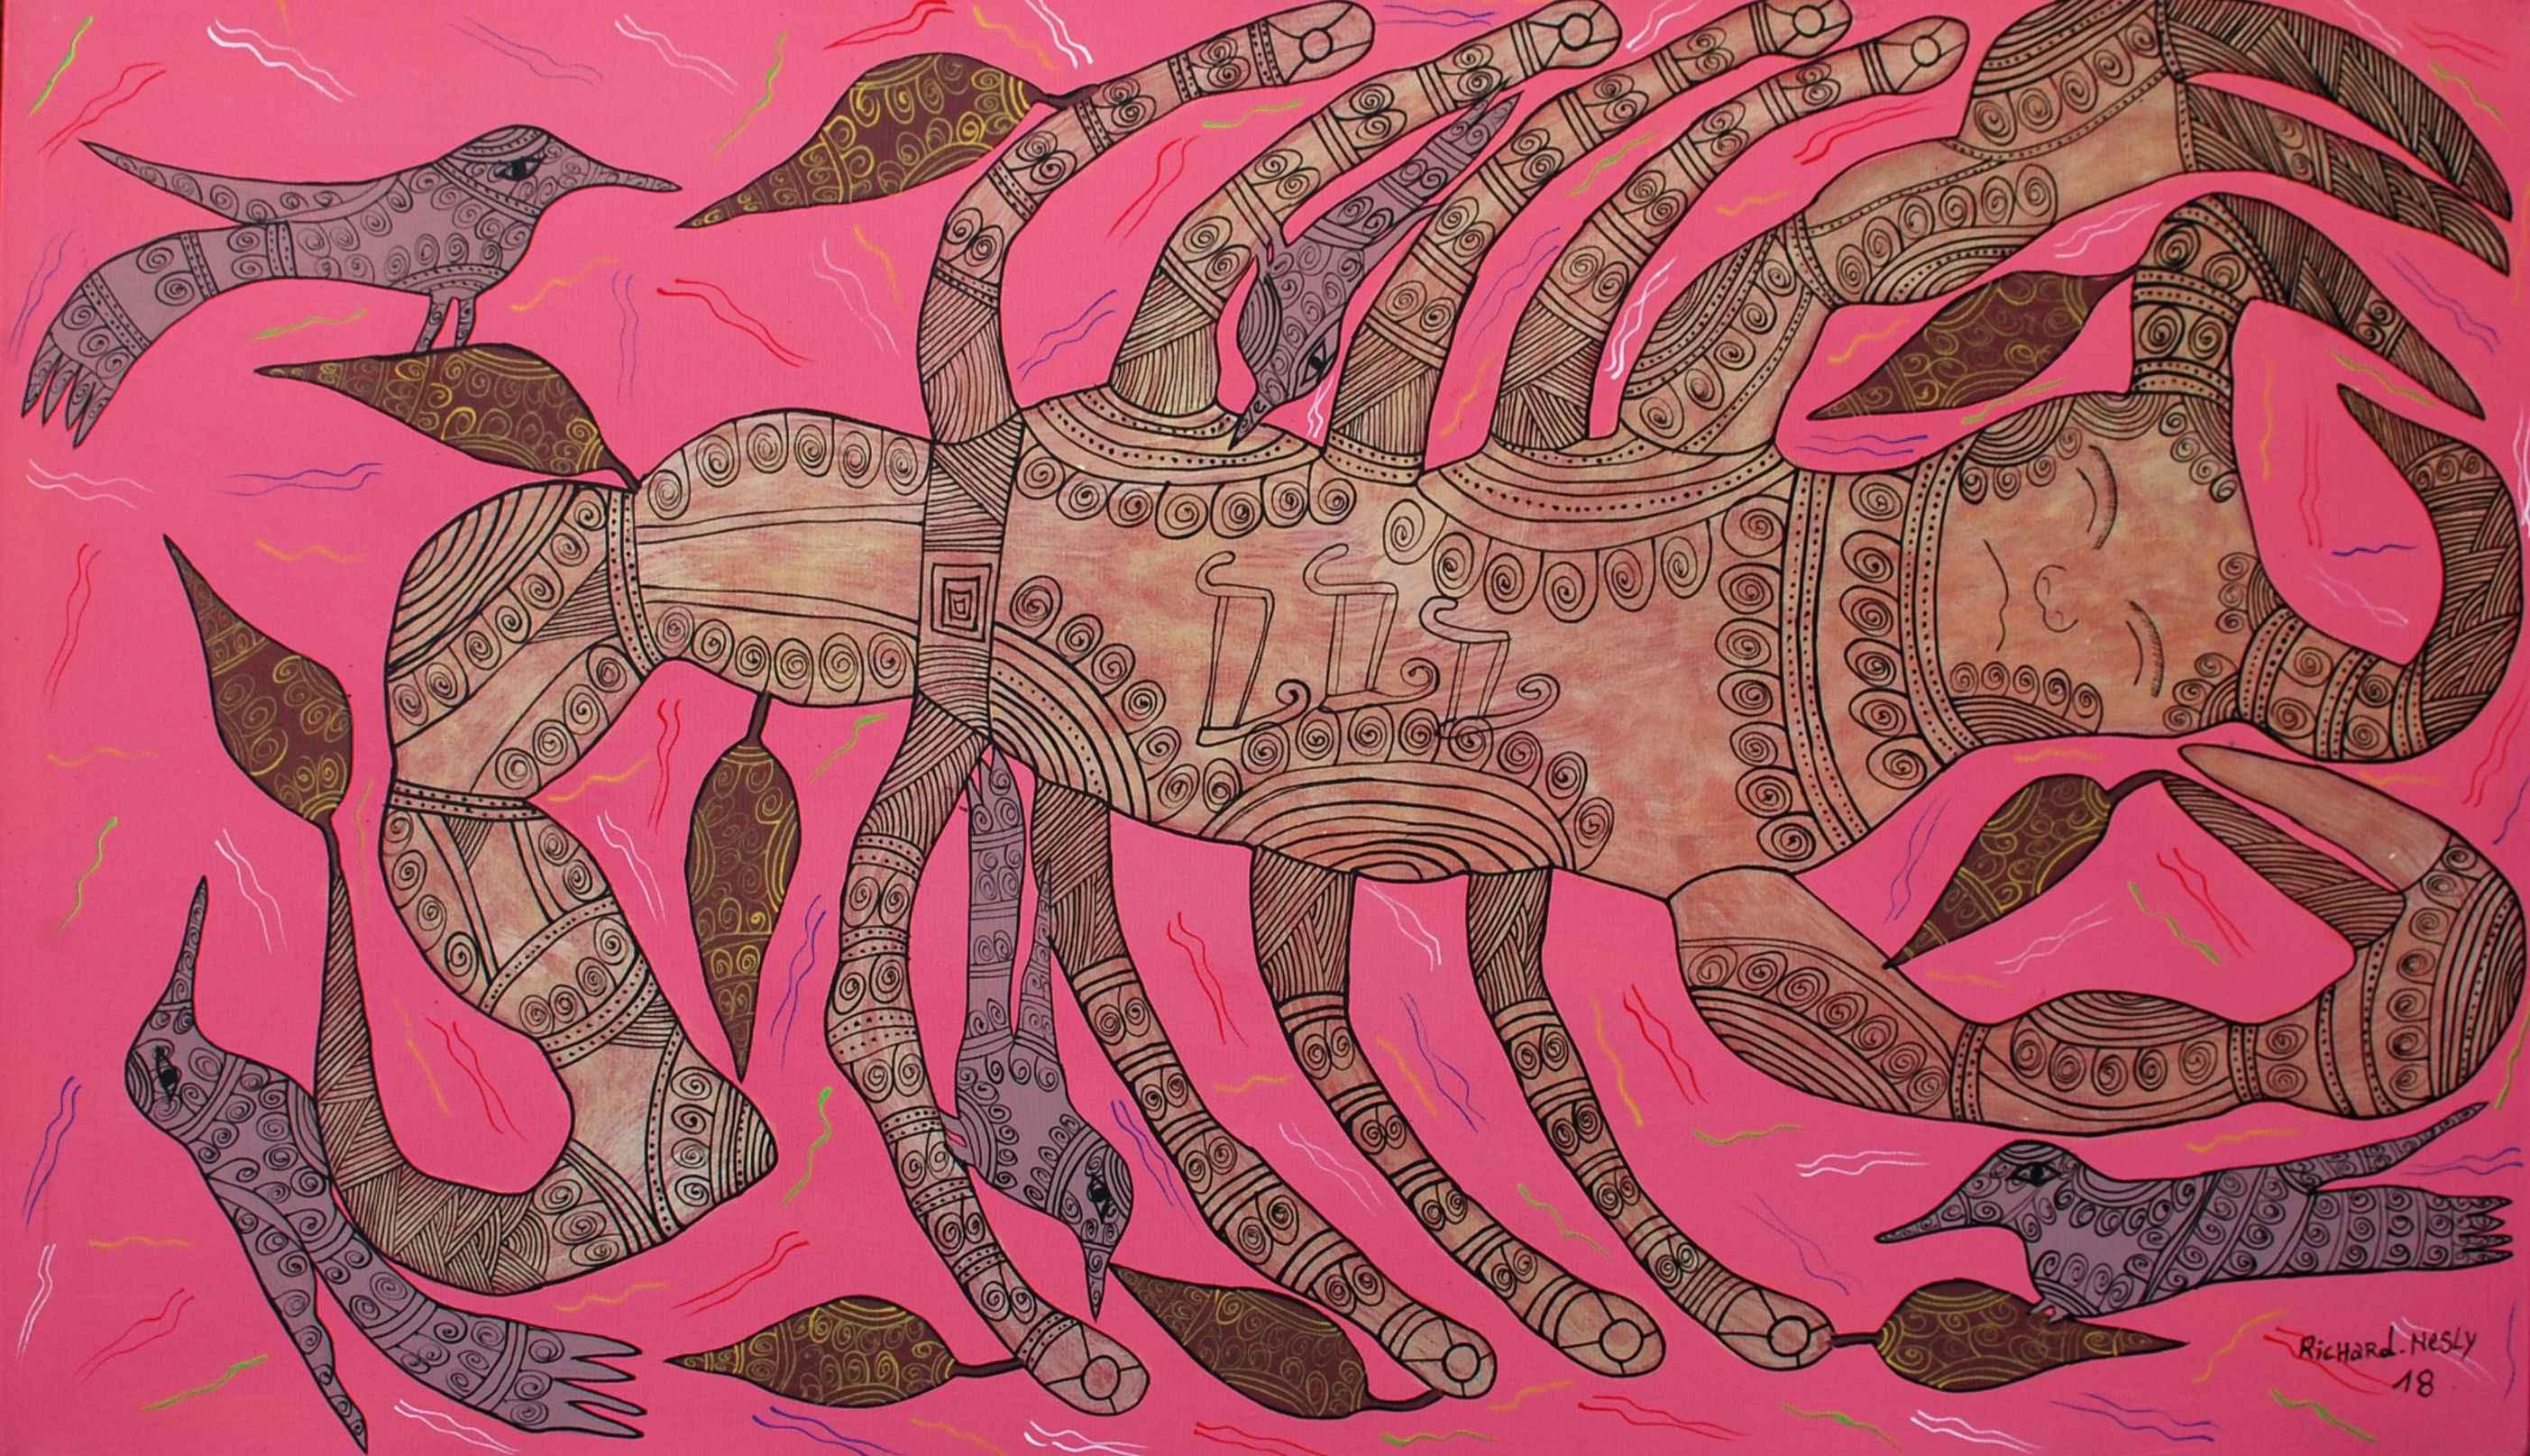 Scorpio by  Richard NESLY - Masterpiece Online